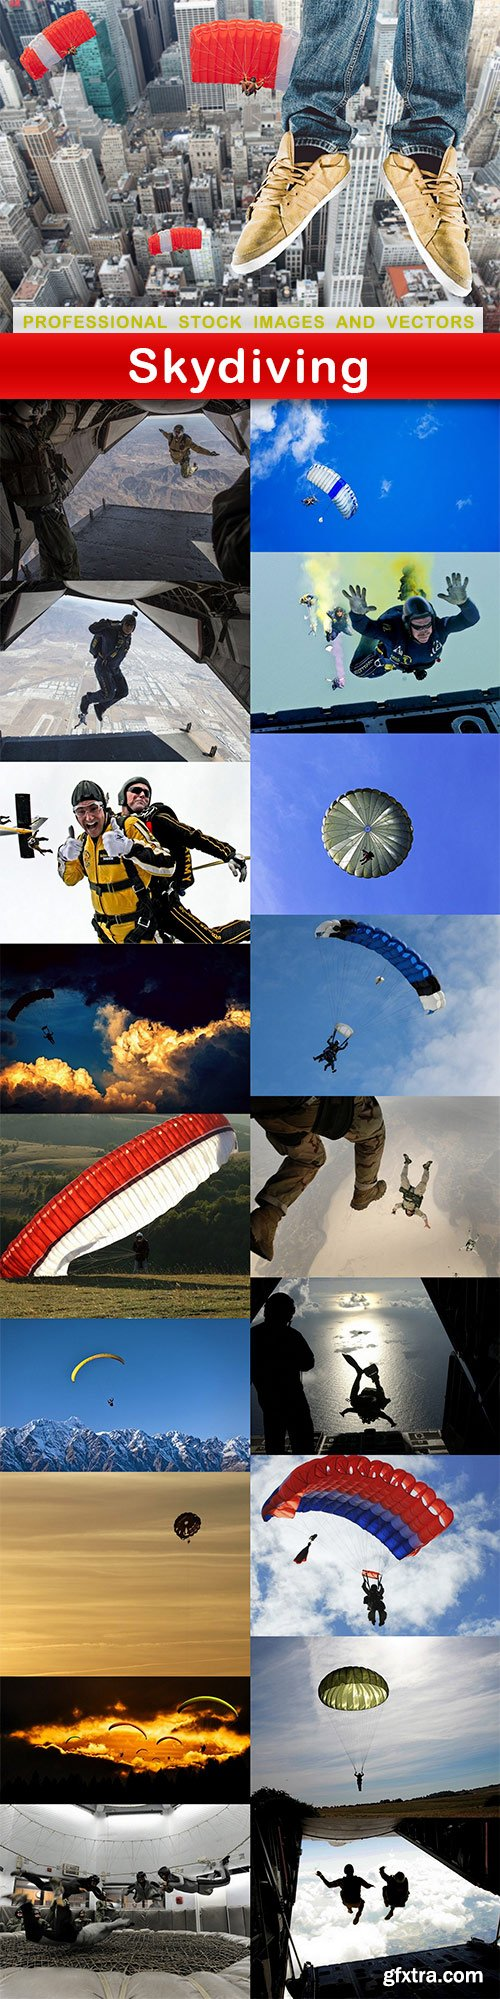 Skydiving - 19 UHQ JPEG